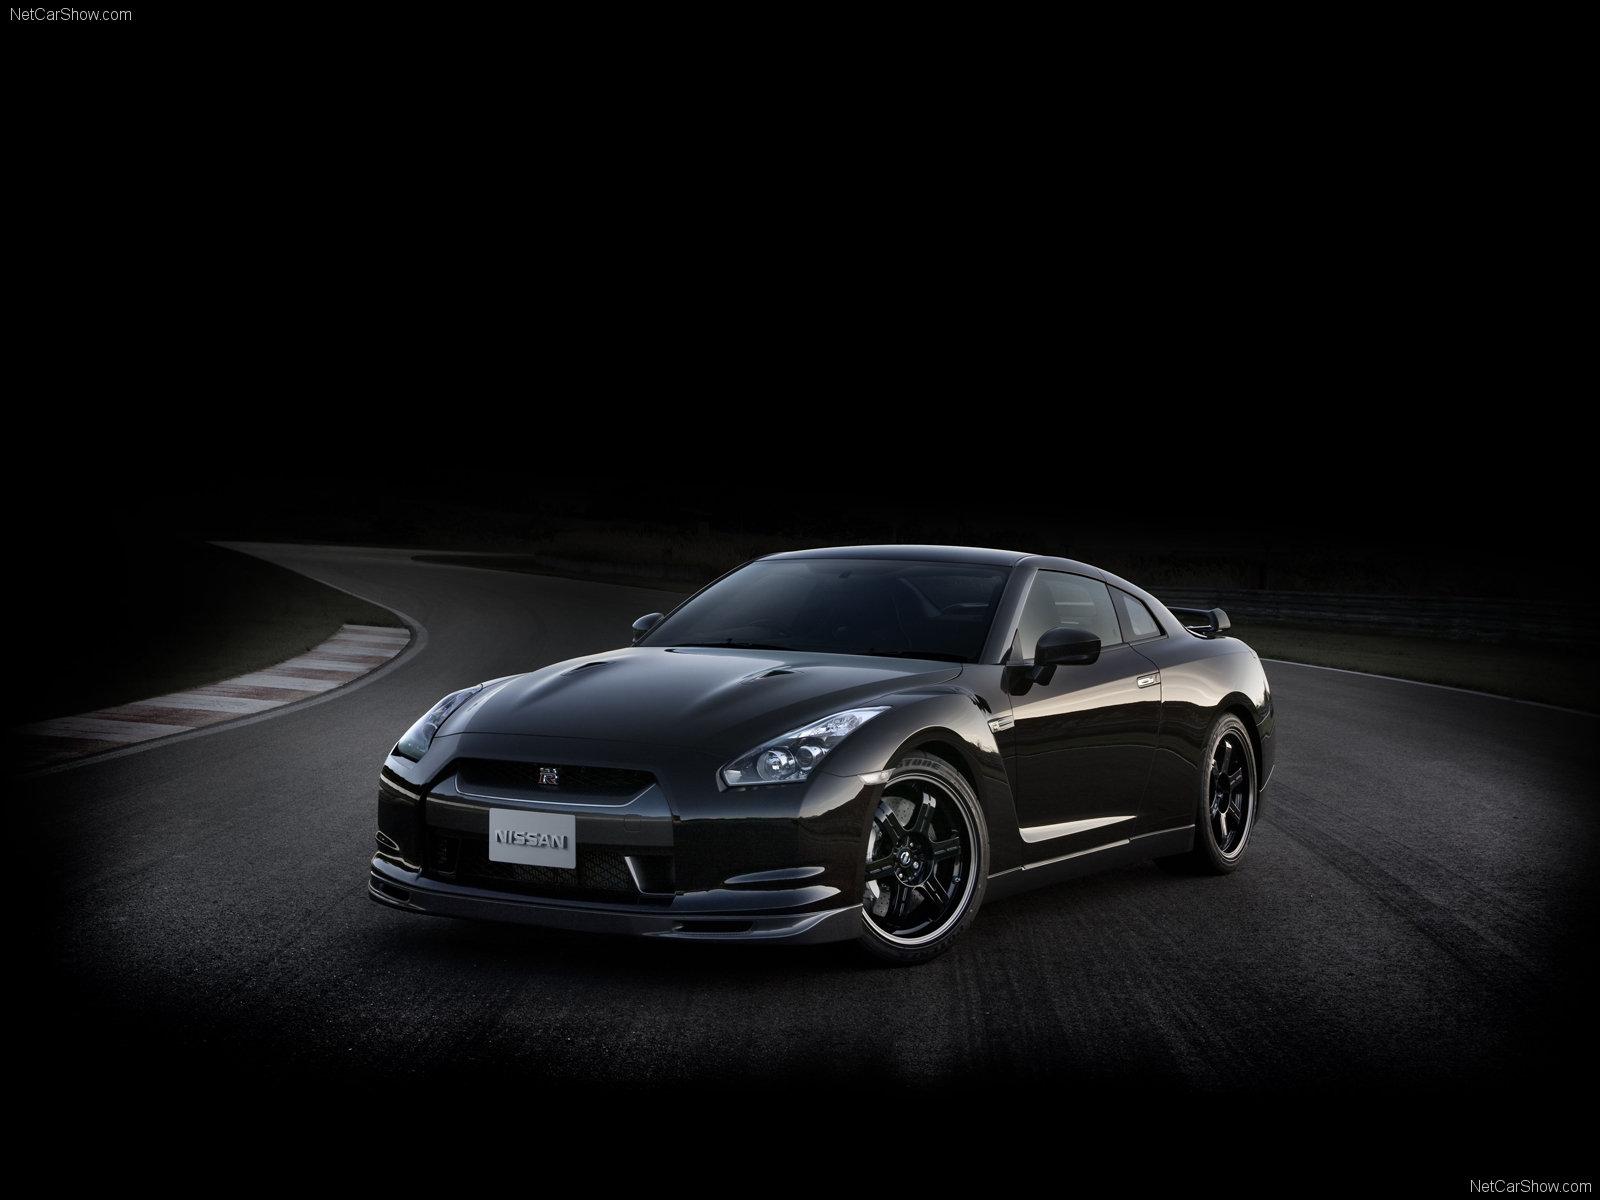 http://4.bp.blogspot.com/_cLWqMZQ1CPk/TNbZ16NxZhI/AAAAAAAADlY/bqo6-4Y-yBc/s1600/Nissan-GT-R_SpecV_2010_1600x1200_wallpaper_01.jpg